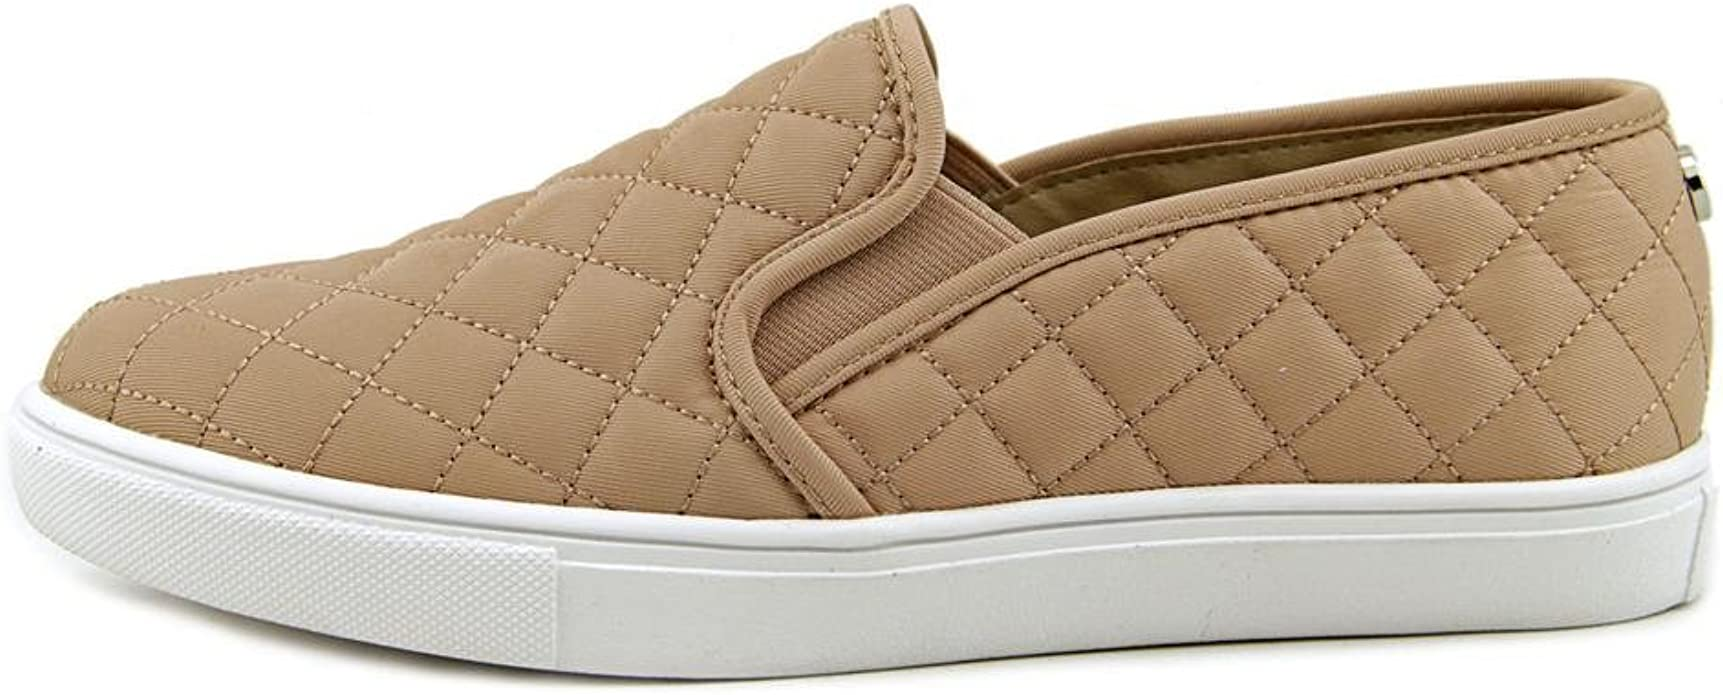 Ecentrcqt Casual Slip On Shoe Pink | Flats